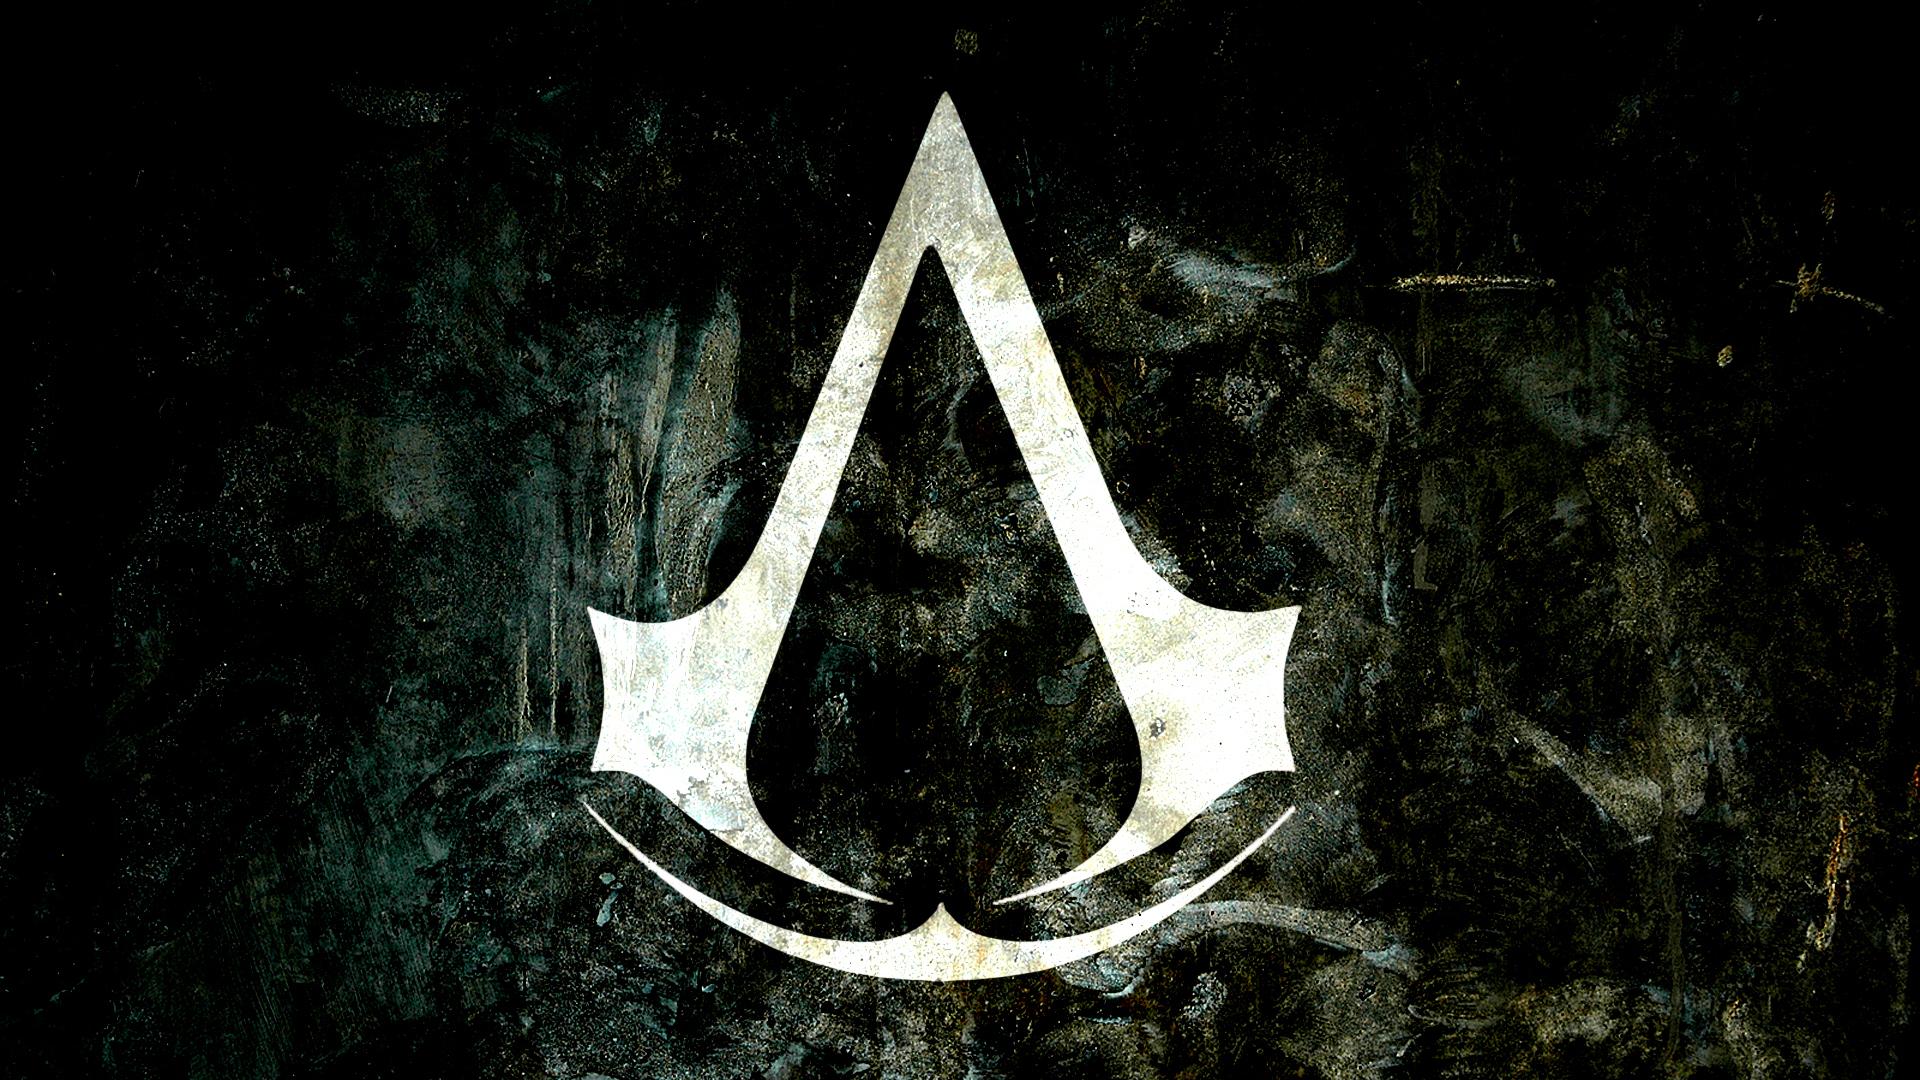 assassins creed game logo wallpaper hd